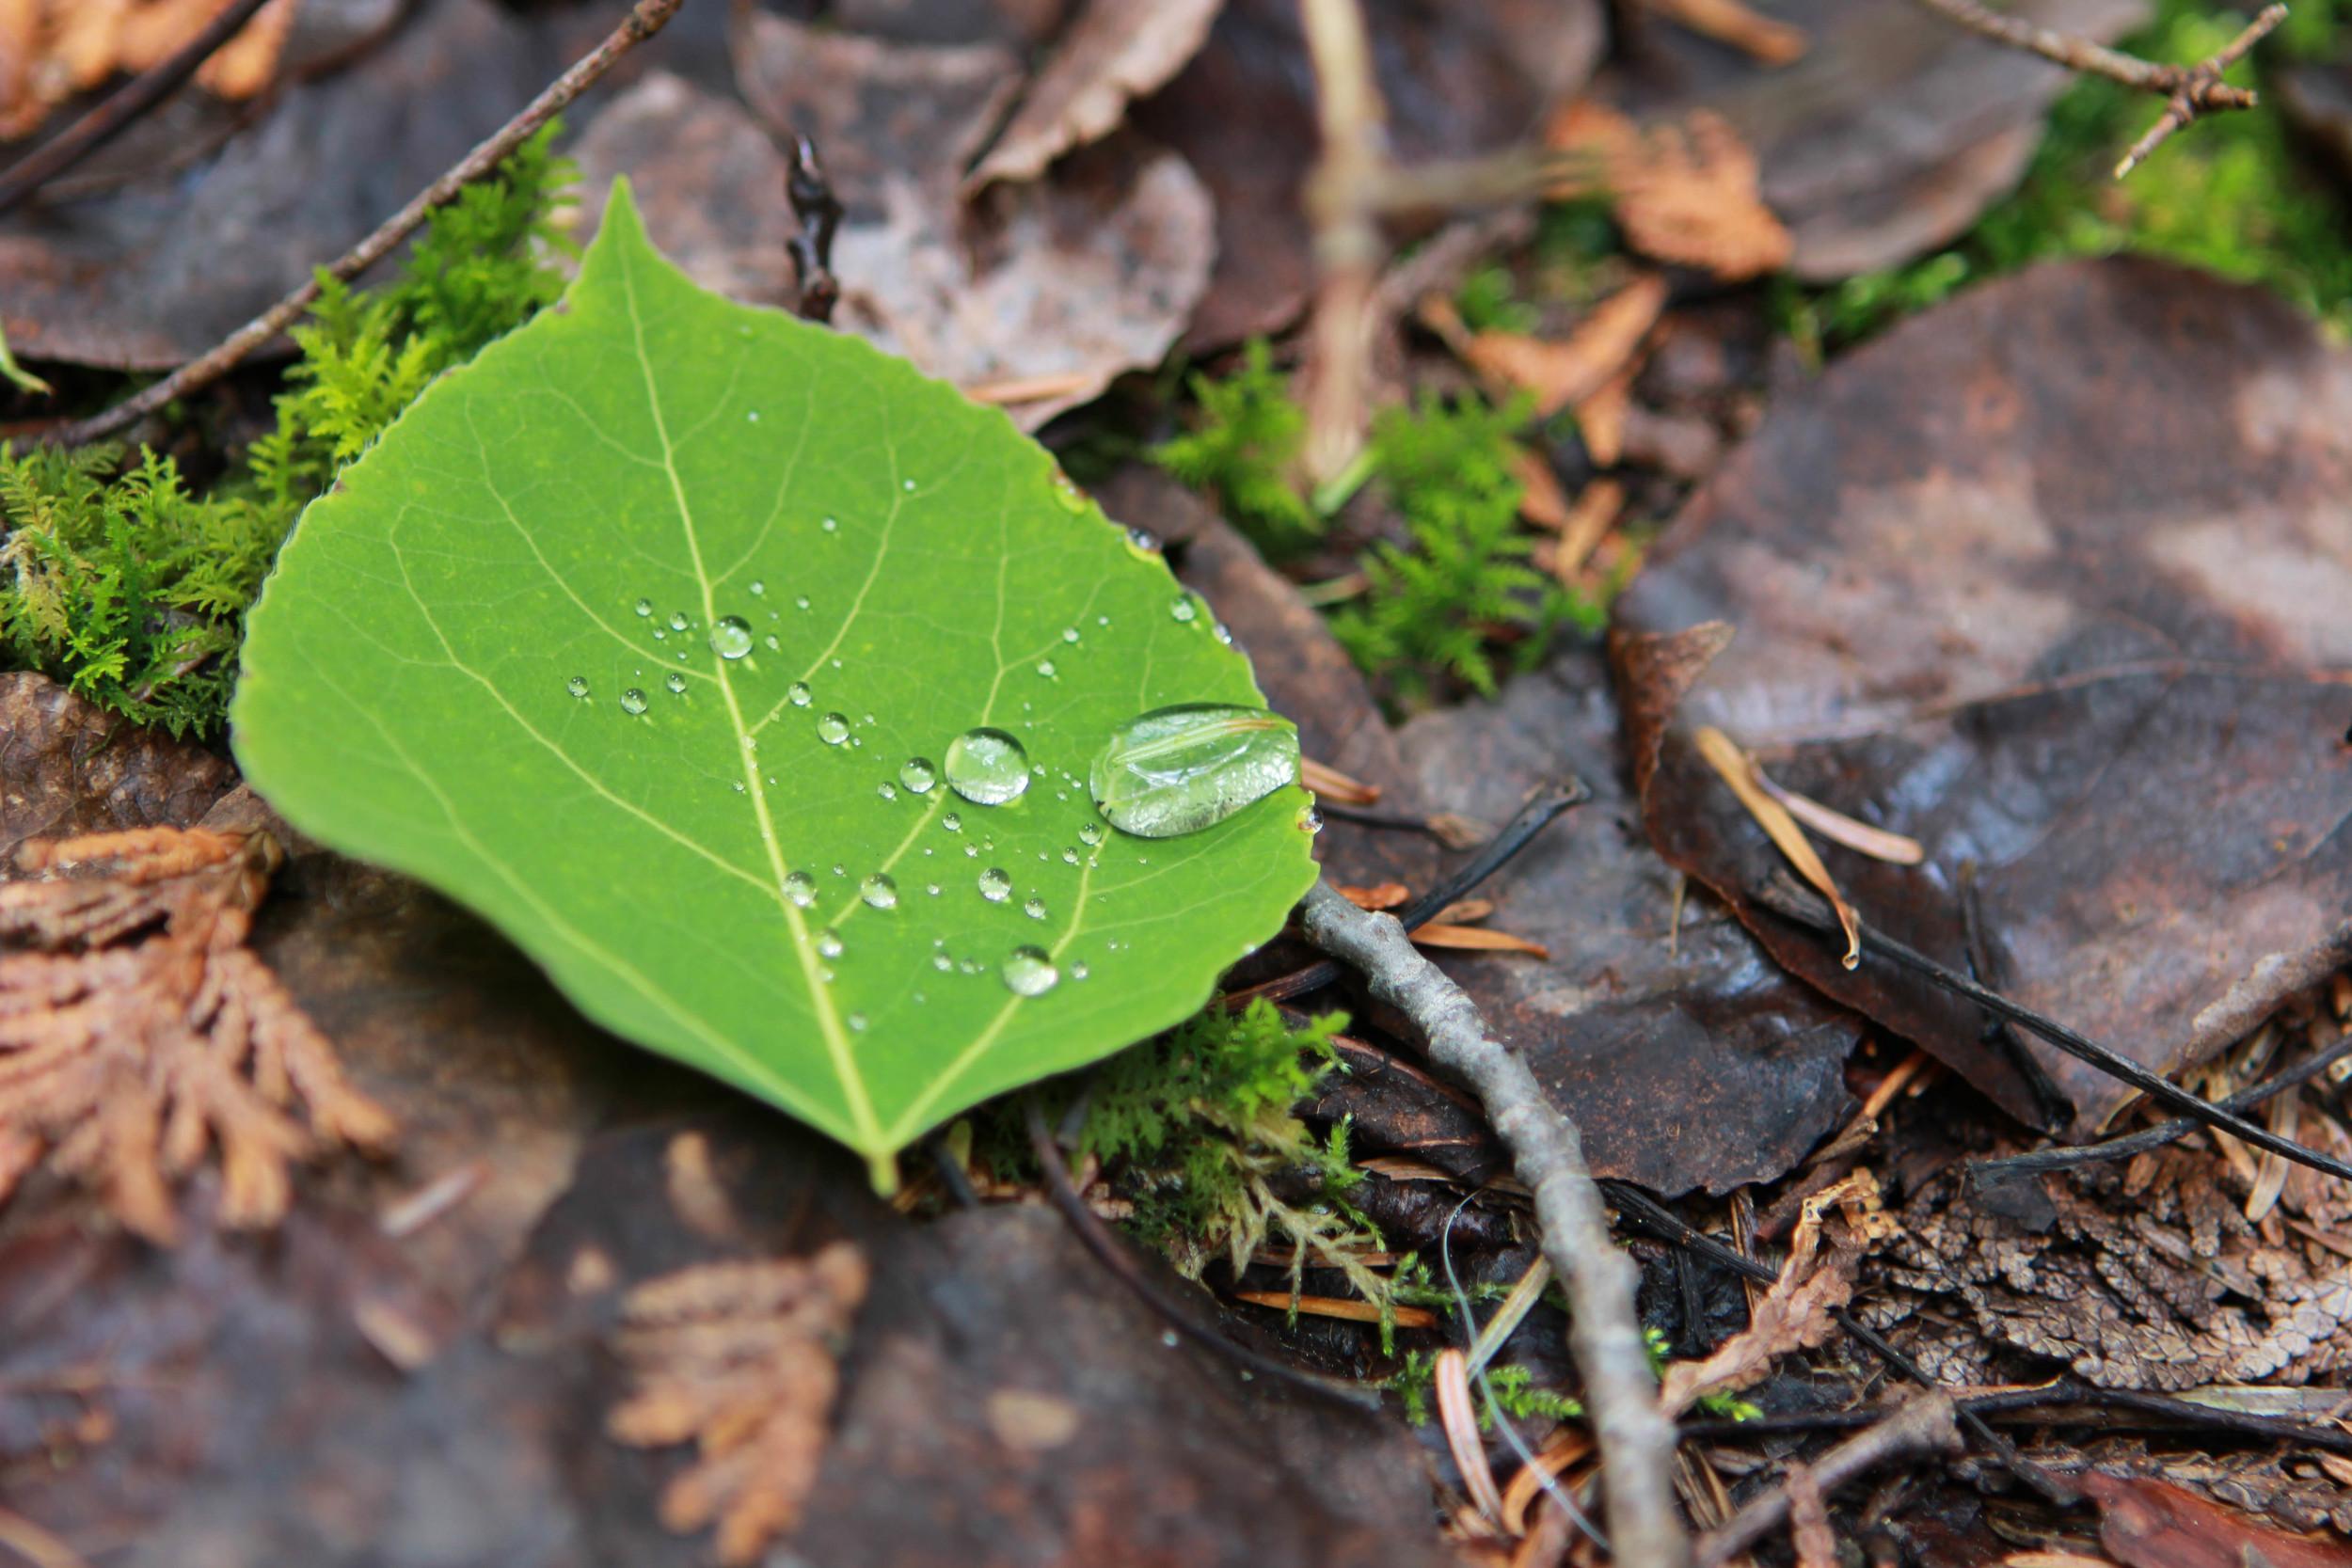 Leaf Rain Droplets - Jess Rudolph Photography: www.jessrudolph.com